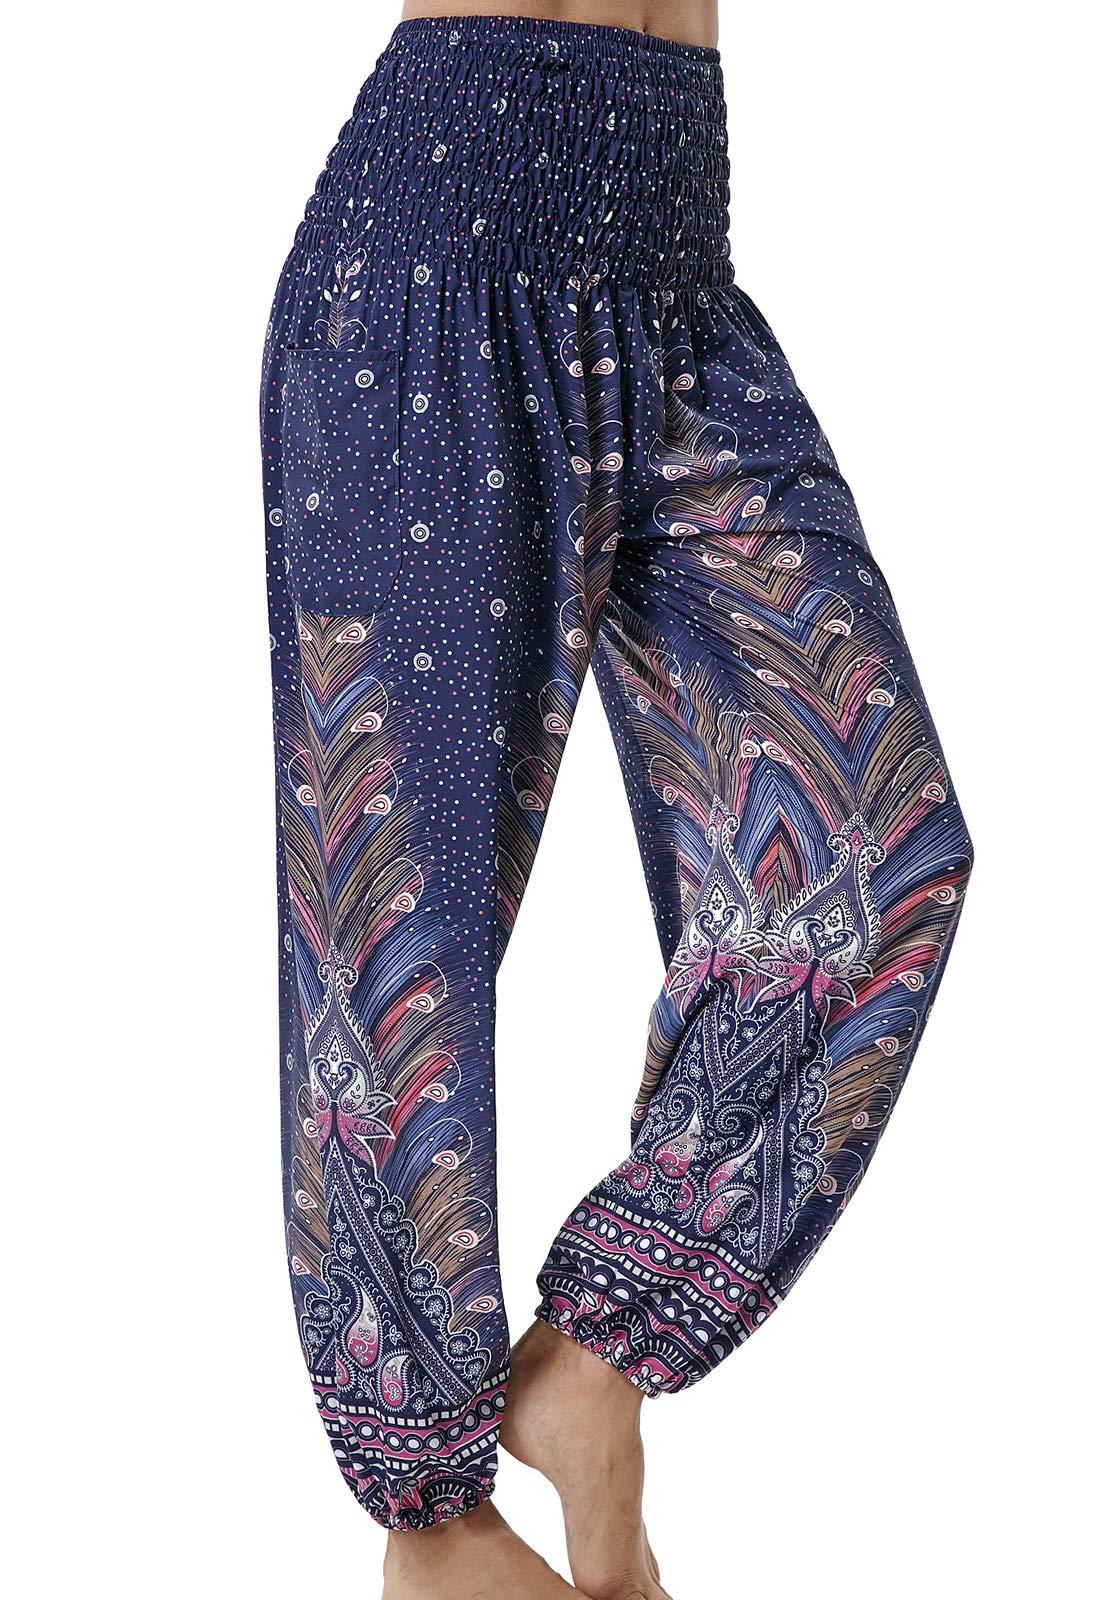 Pantalones de Yoga Sueltos Mujer Harem Boho del Lazo del Pavo Real Flaral Funky product image